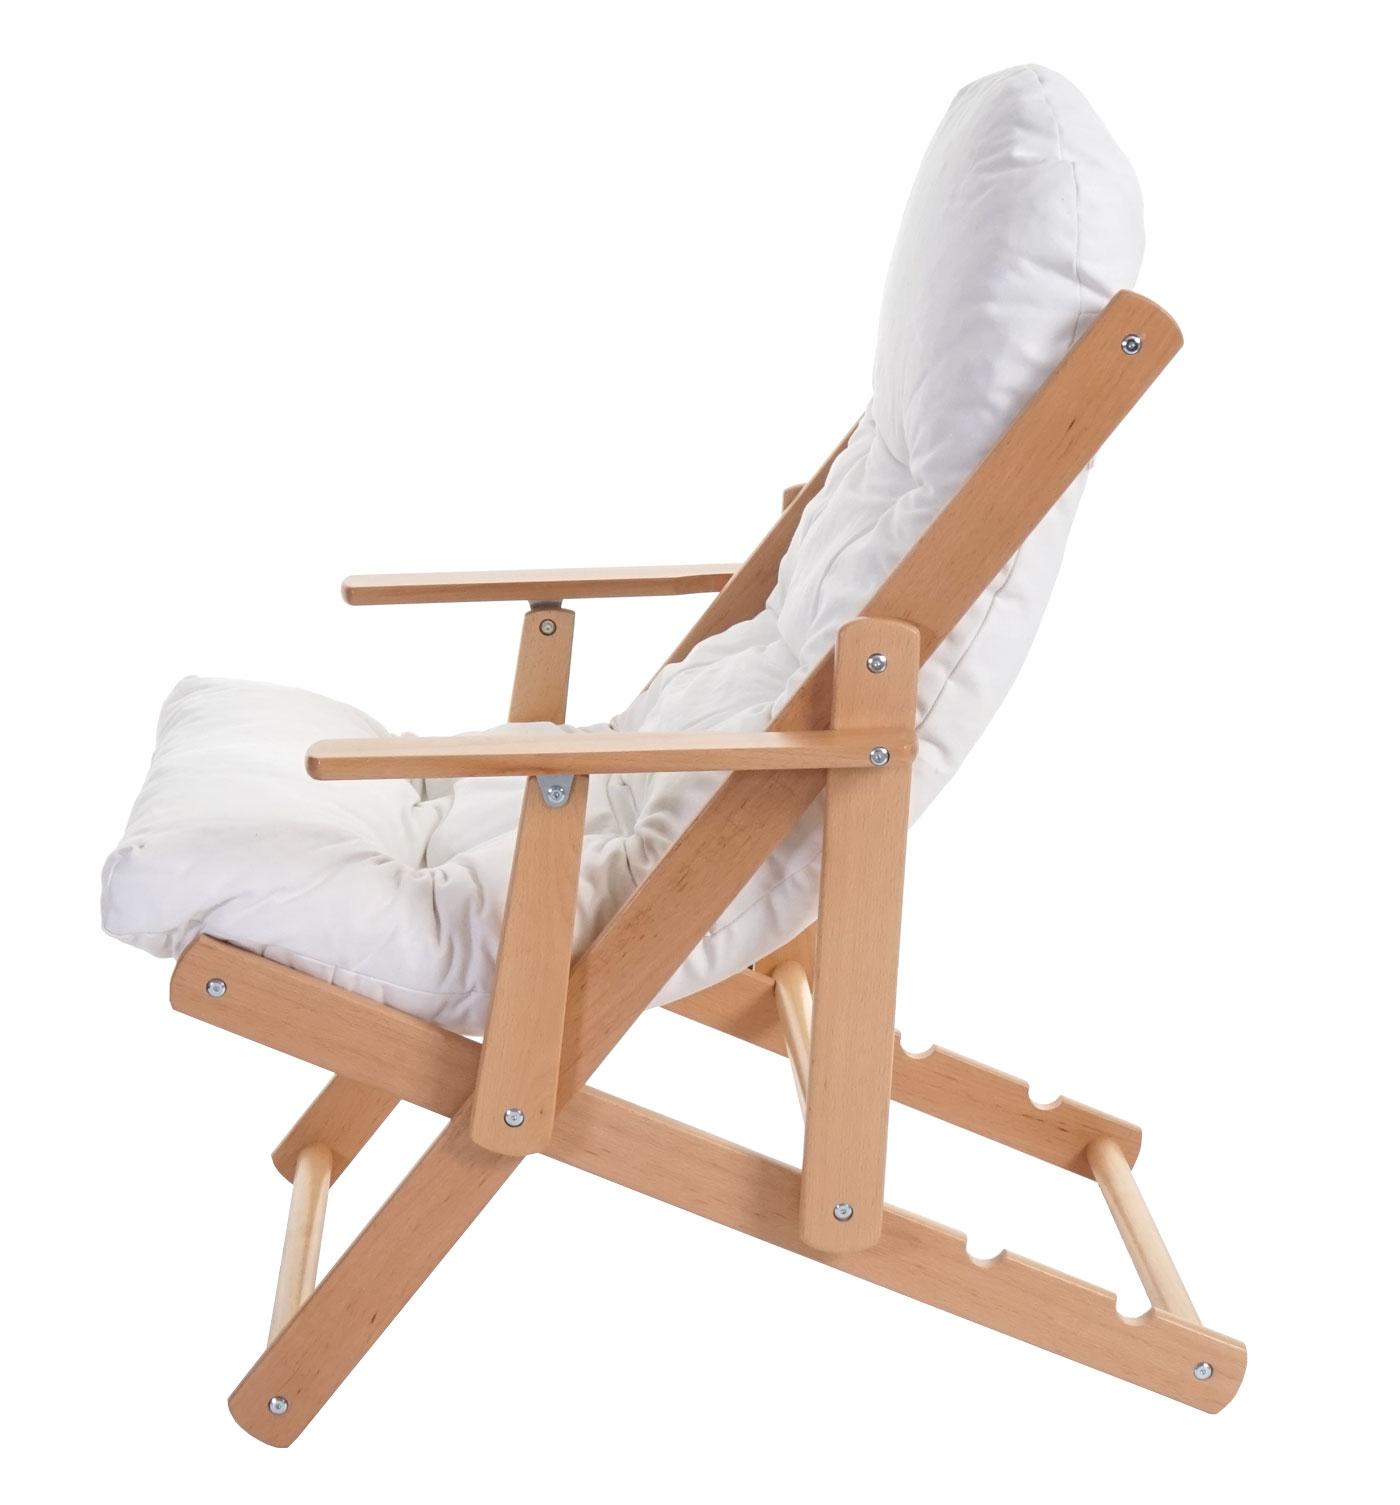 relaxsessel klappbar 75 lidl relaxsessel beste ideen f r. Black Bedroom Furniture Sets. Home Design Ideas